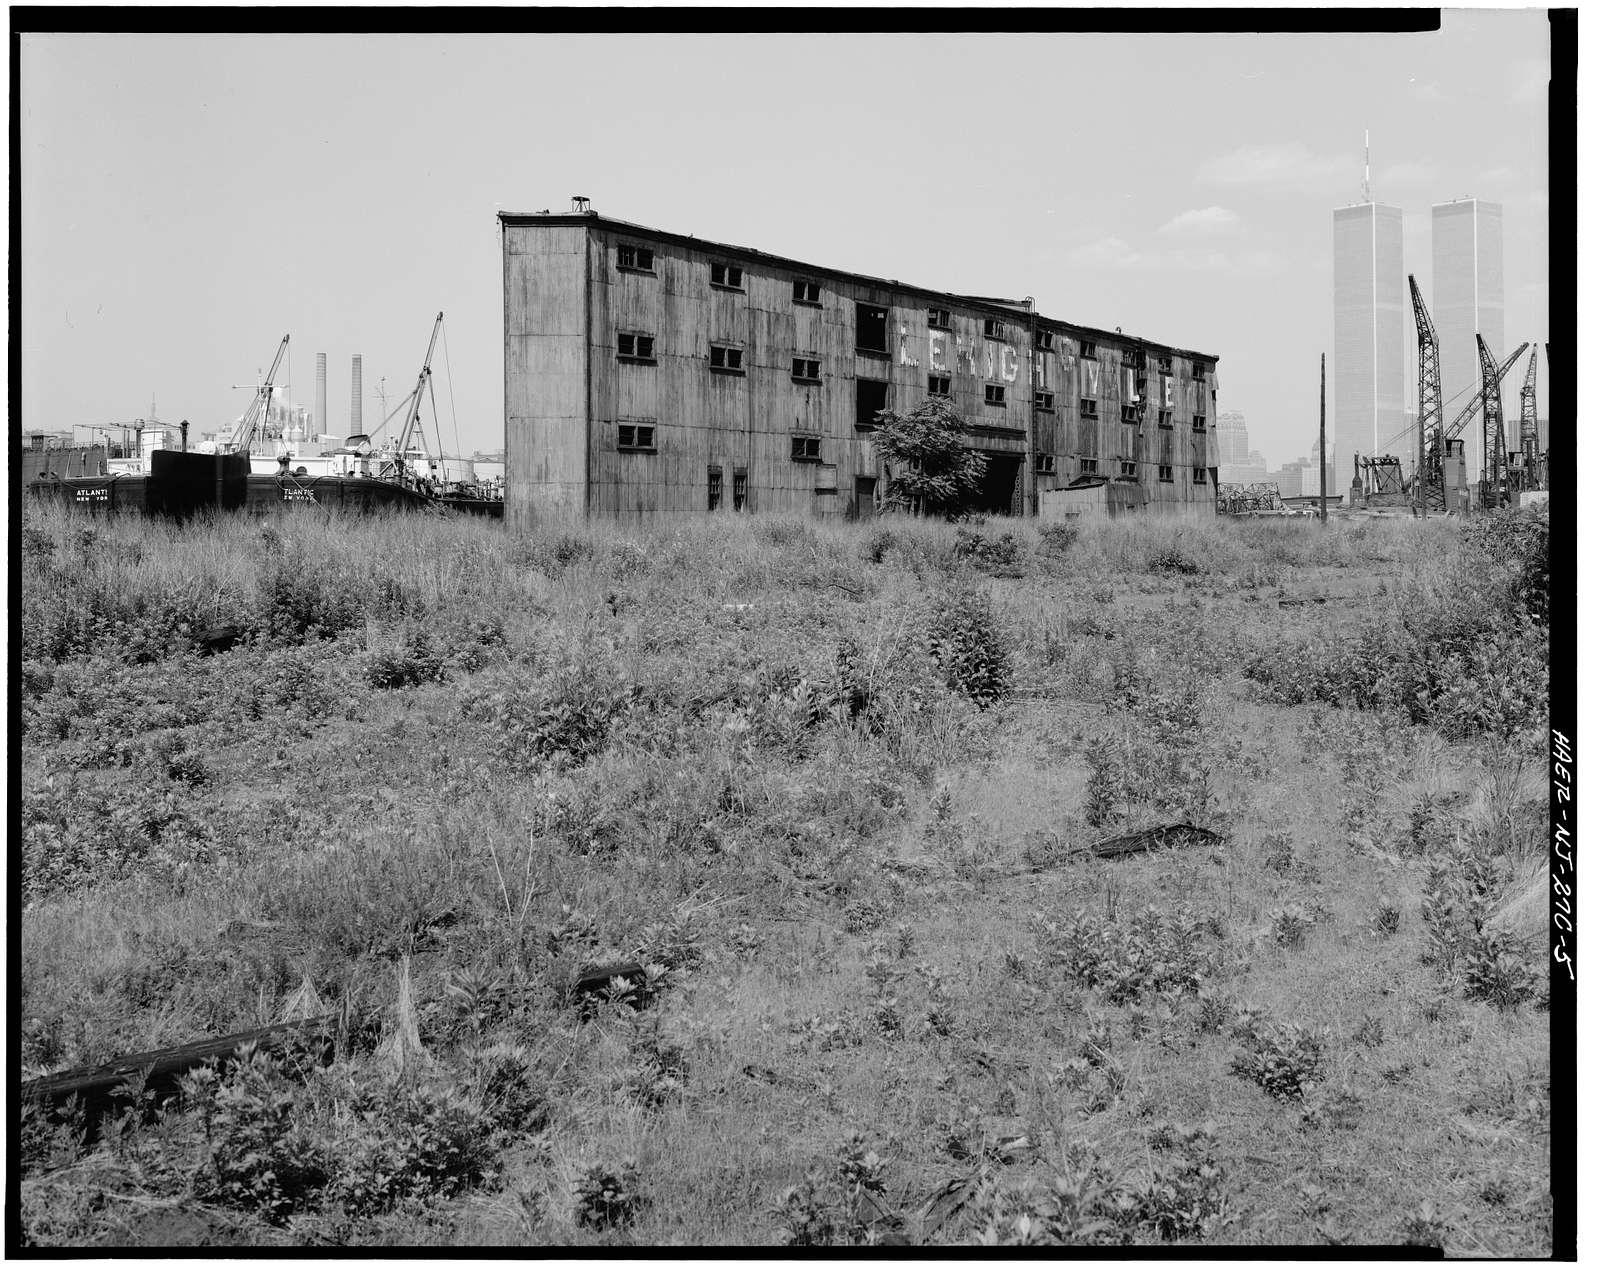 Lehigh Valley Railroad, Pier G, Jersey City, Hudson County, NJ